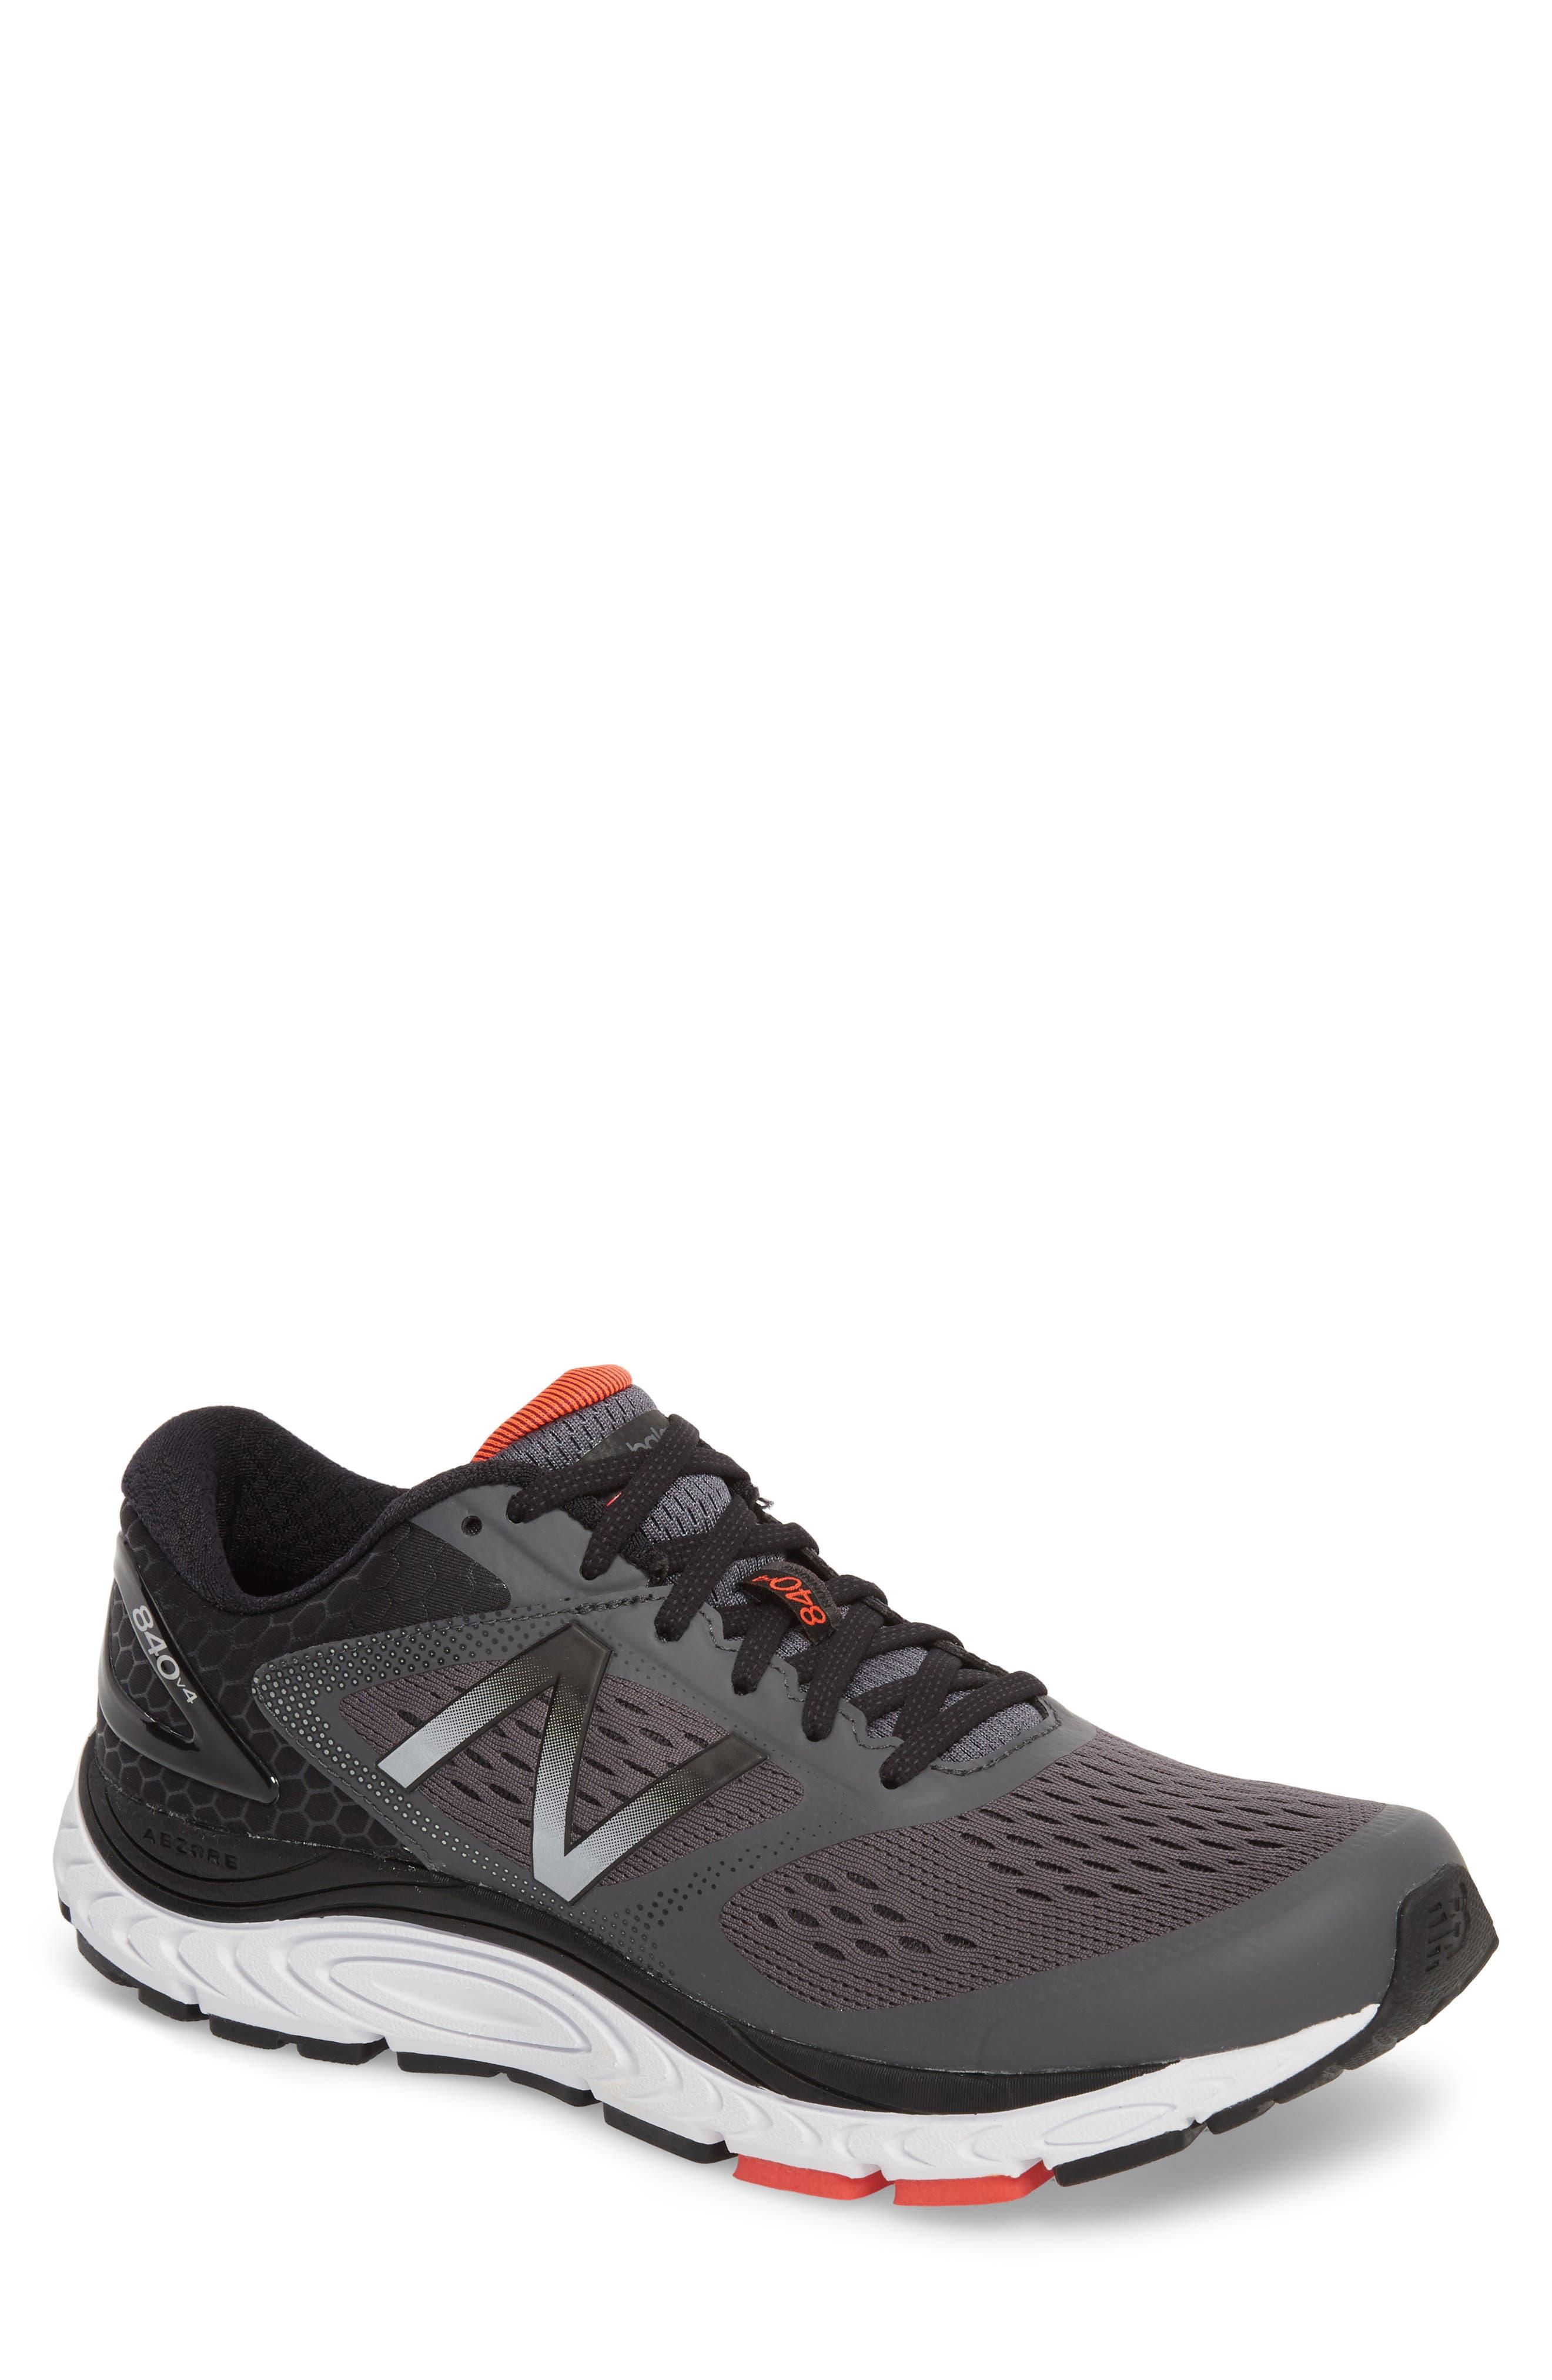 840v4 Running Shoe,                             Main thumbnail 1, color,                             Dark Grey